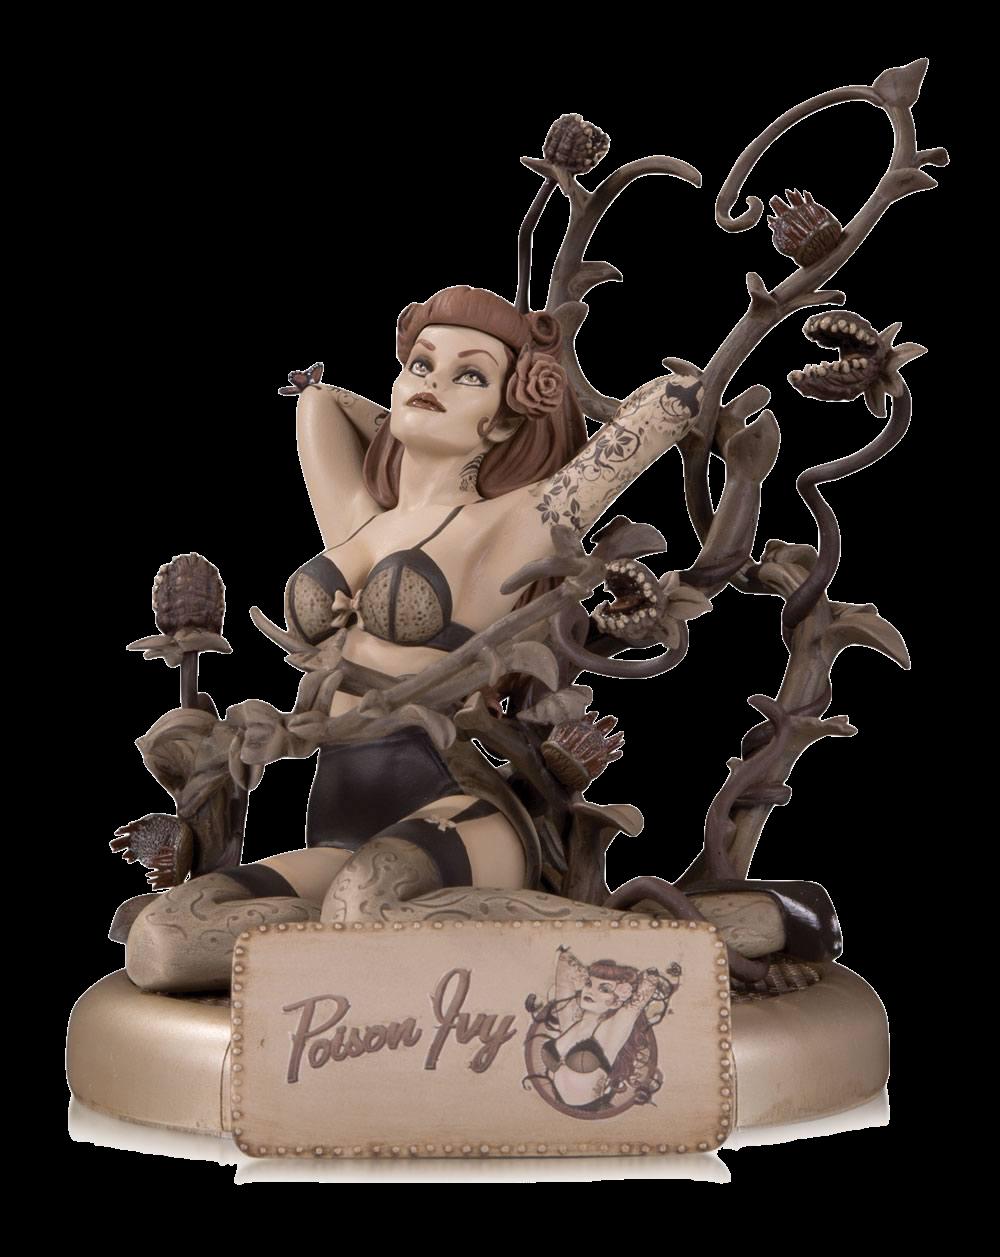 dc-bobmshells-poison-ivy-sepia-variant-statue-toyslife